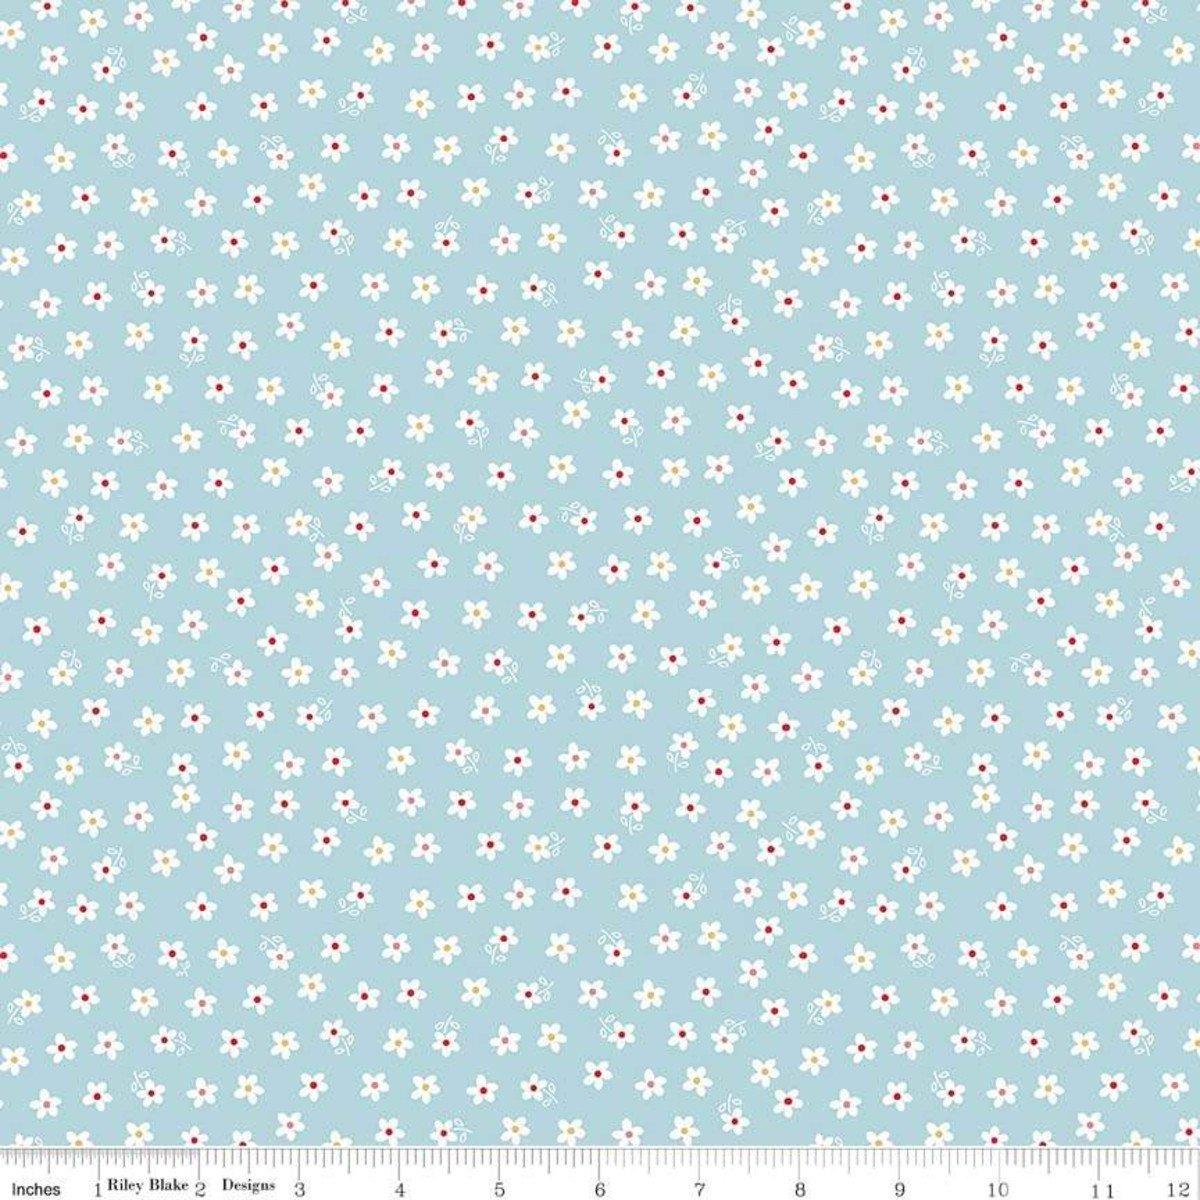 Calico Days Daisy Aqua Stretch Jersey Knit Fabric by Riley Blake Designs